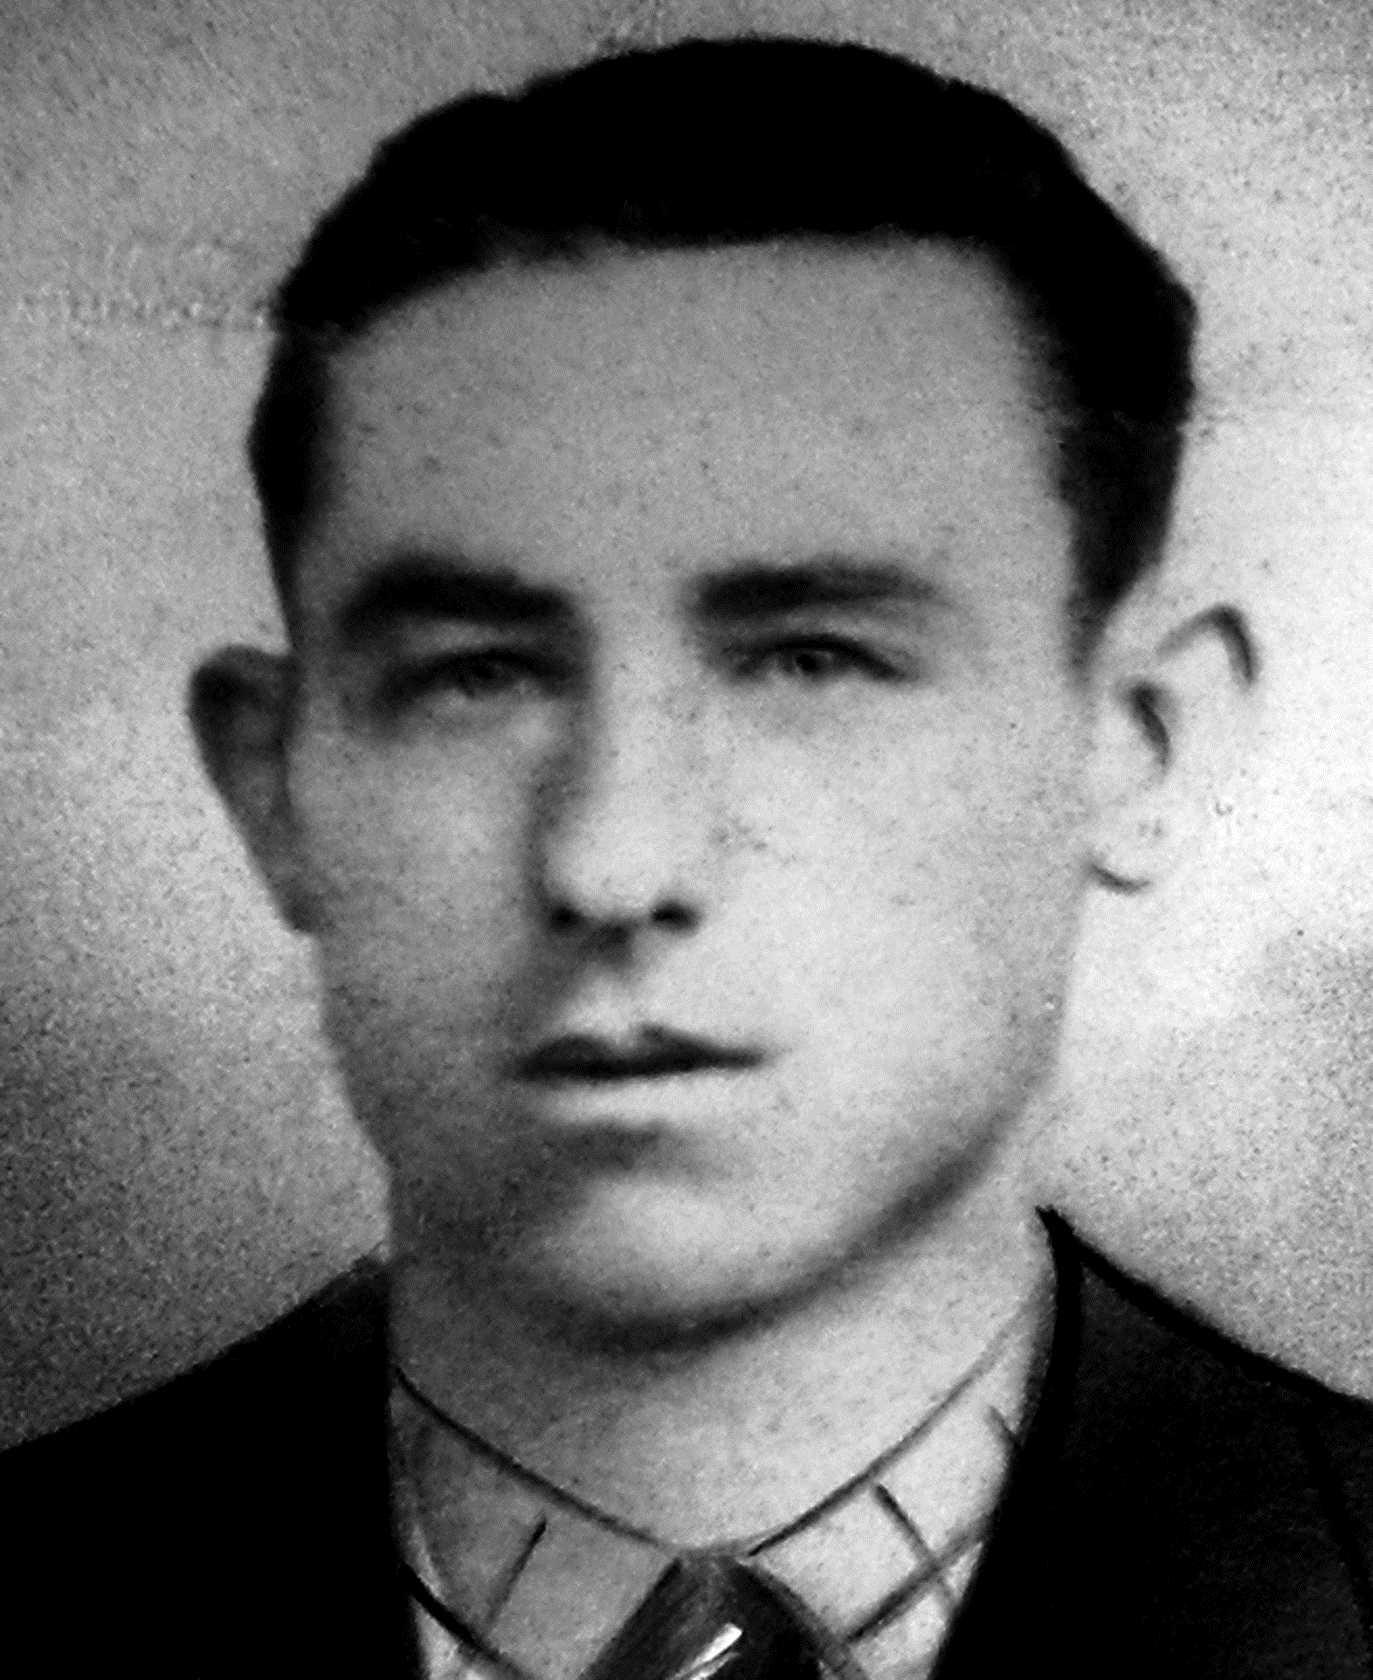 José Caparrós Pérez